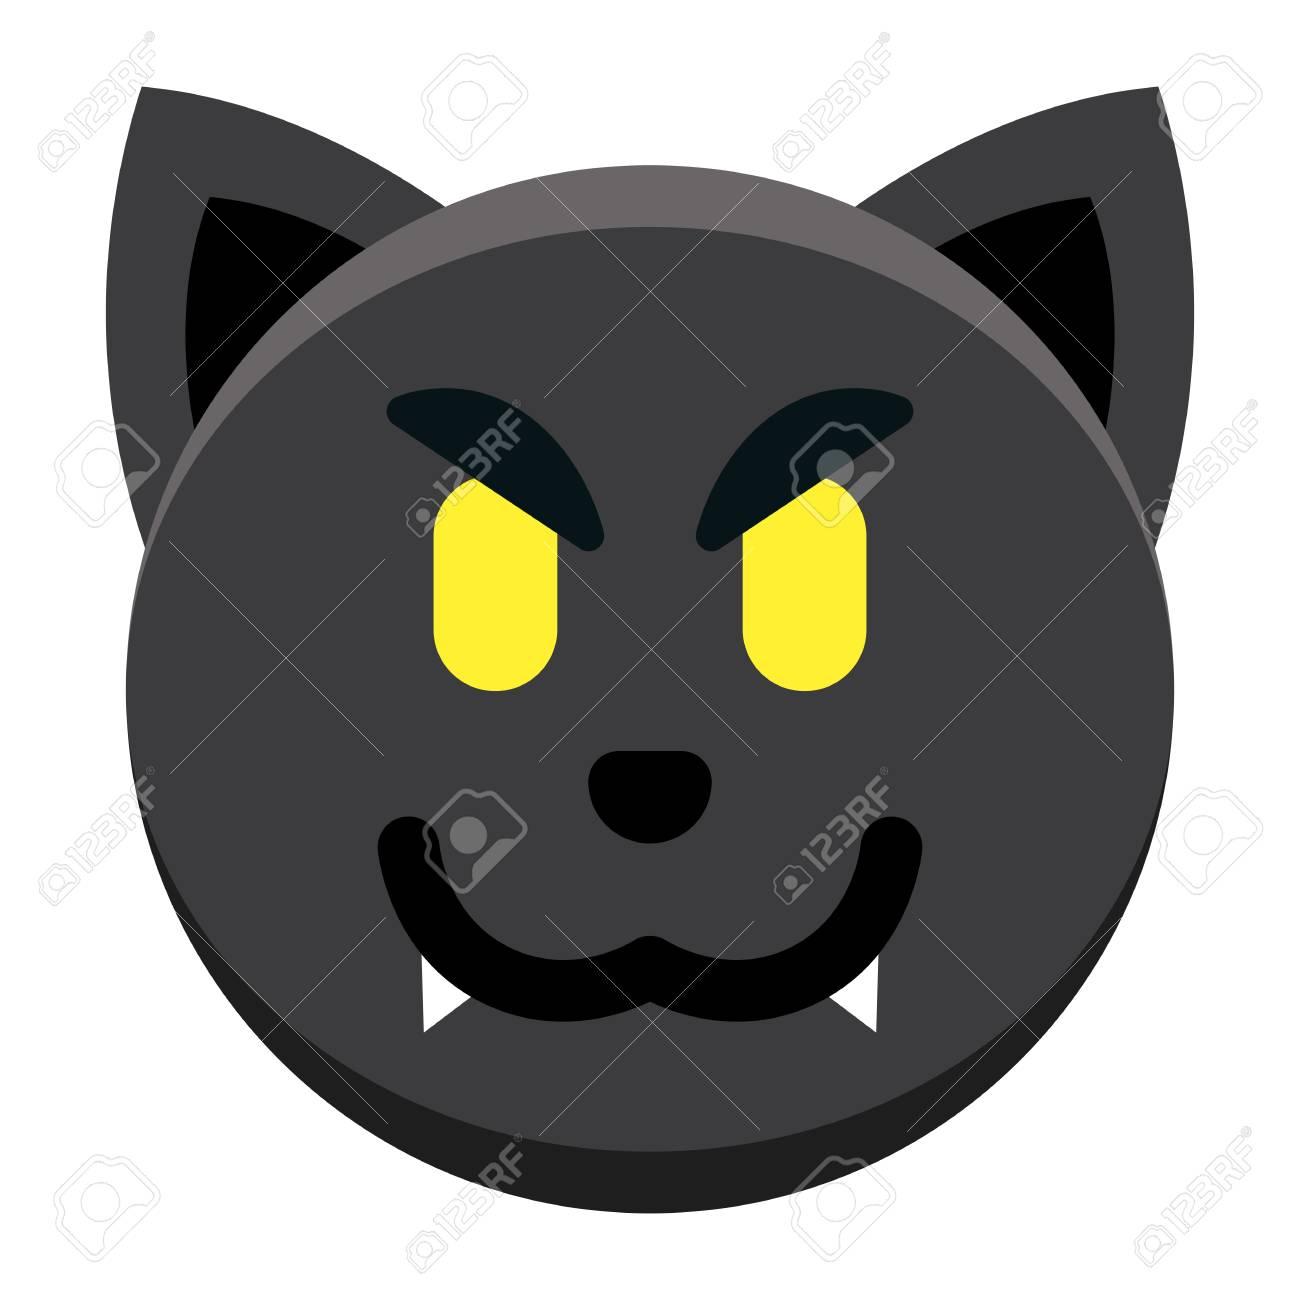 Vector Cartoon Black Cat Emoji Isolated On White Background Royalty